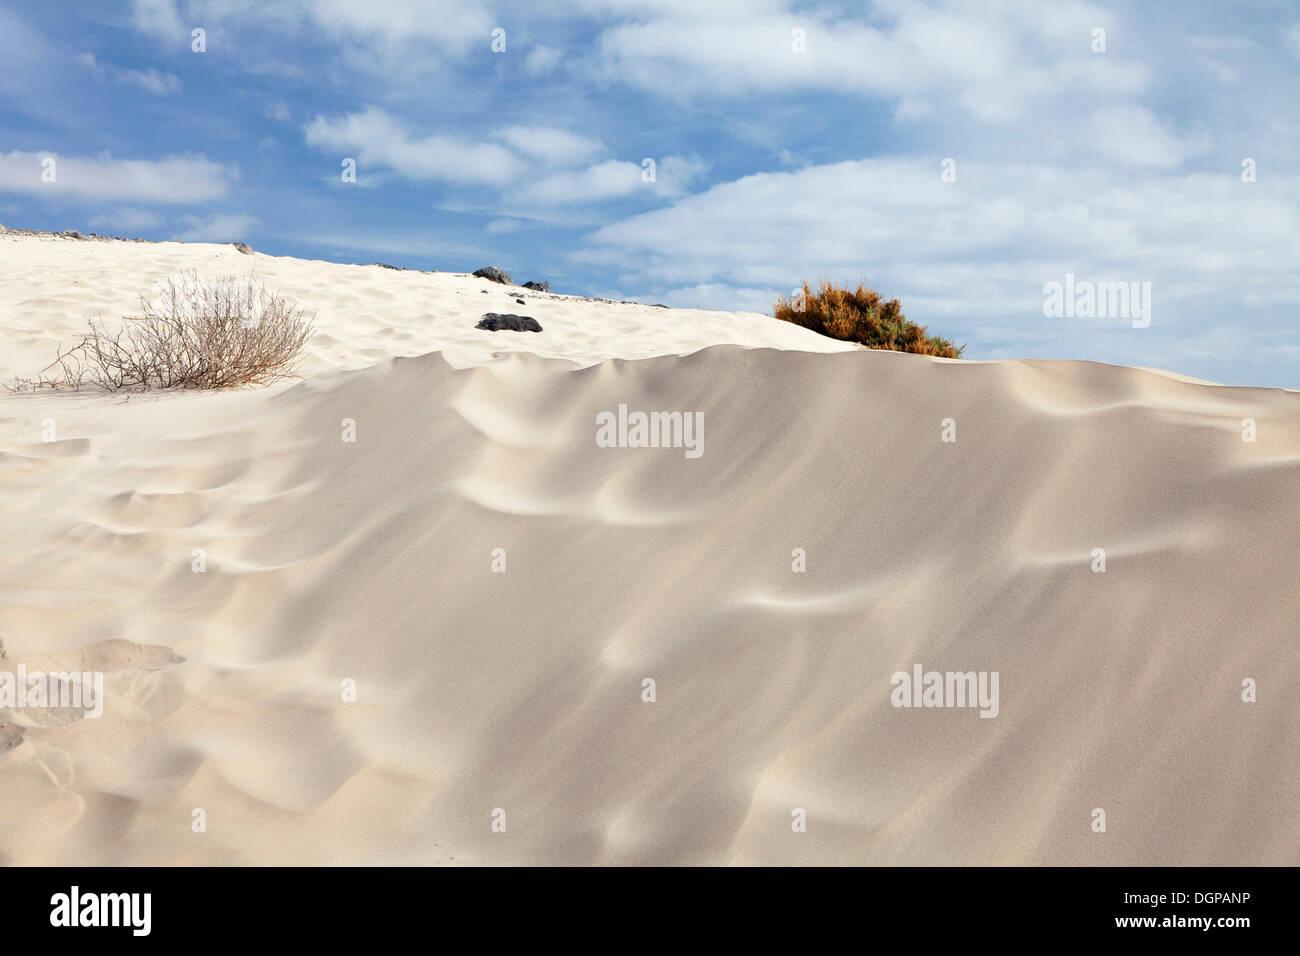 Sand dunes, dune landscape, Risco del Paso, Fuerteventura, Canary Islands, Spain - Stock Image